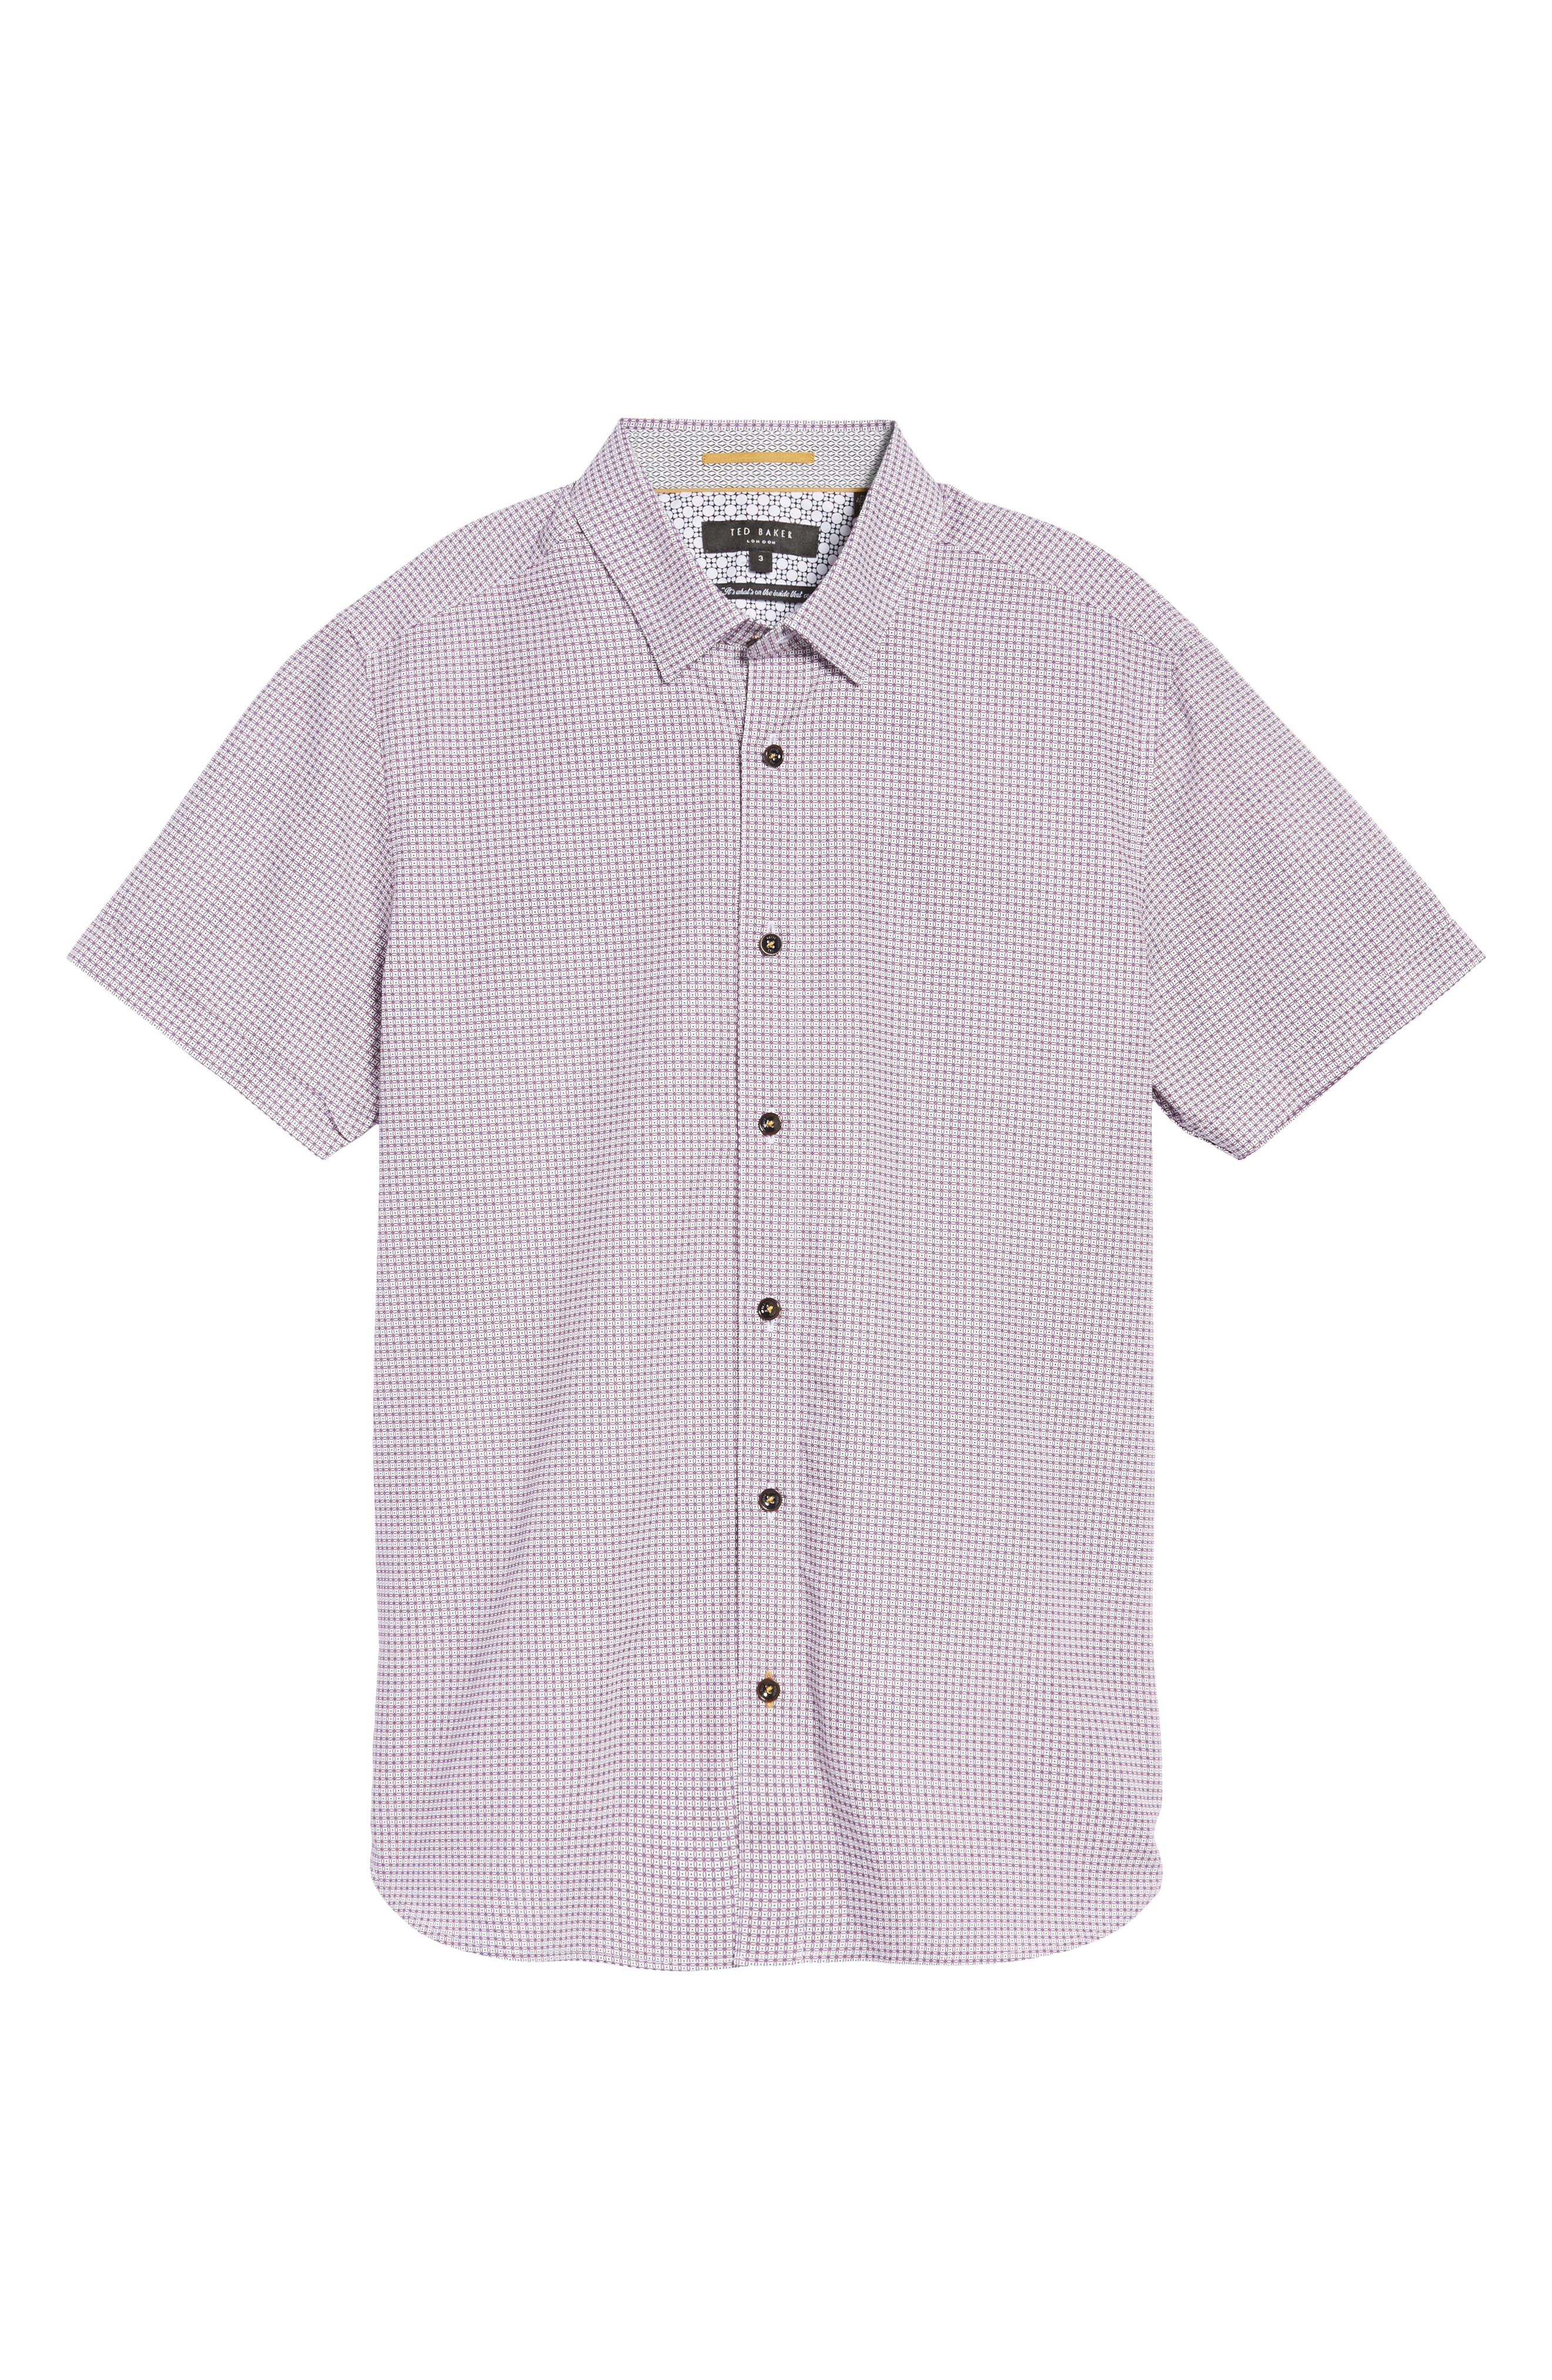 Tennent Trim Fit Microprint Woven Shirt,                             Alternate thumbnail 5, color,                             Dp Purple